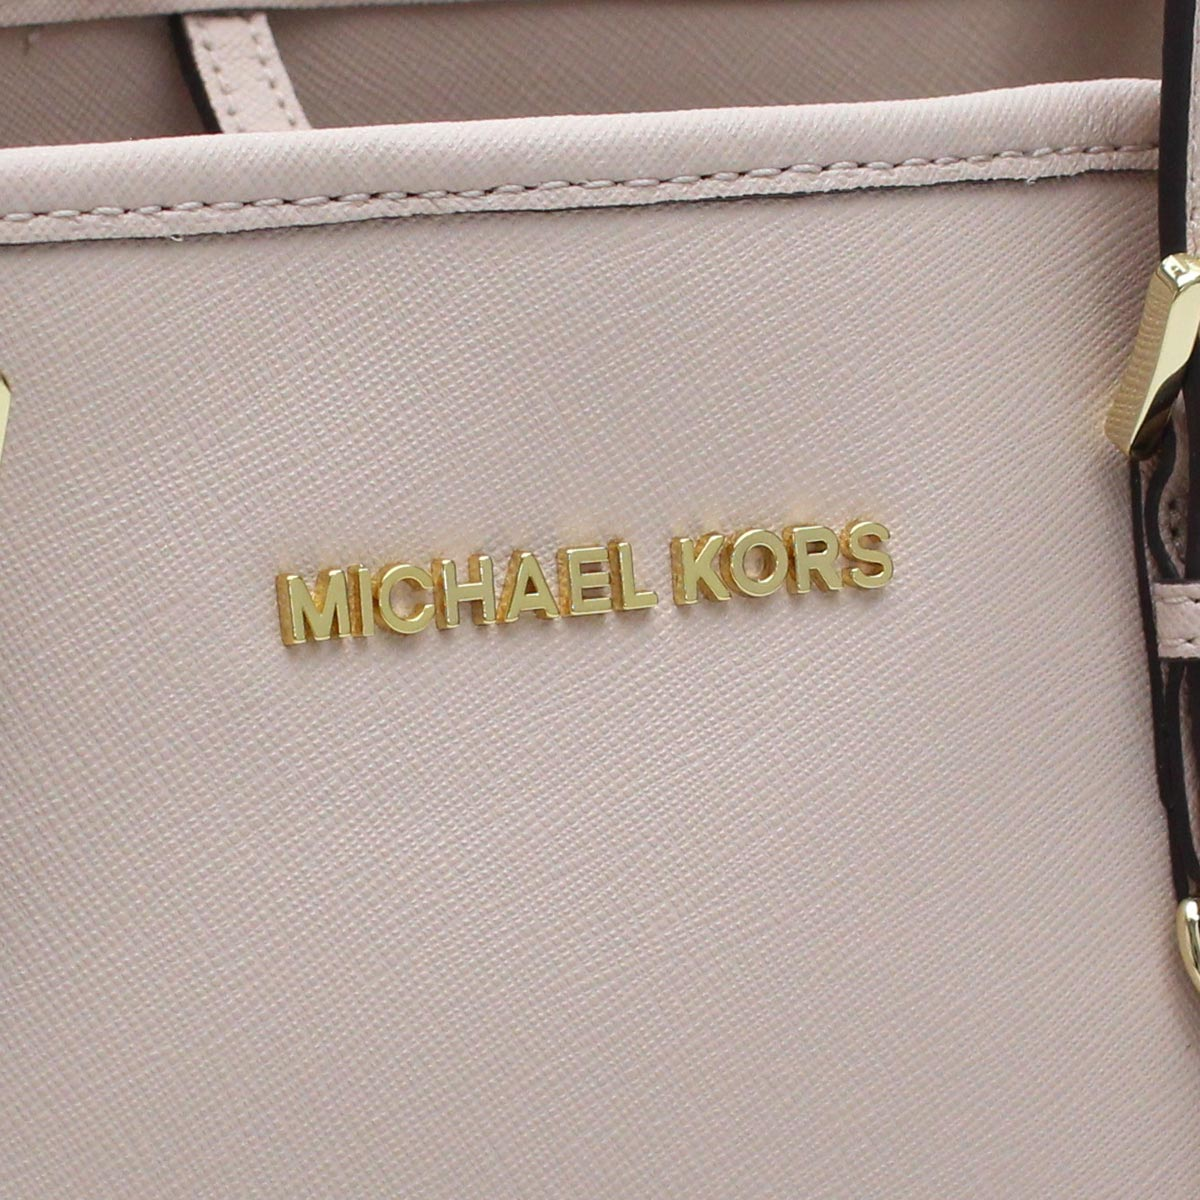 c4998f96623a0 Bighit The total brand wholesale  Michael Kors (MICHAEL KORS) JET ...